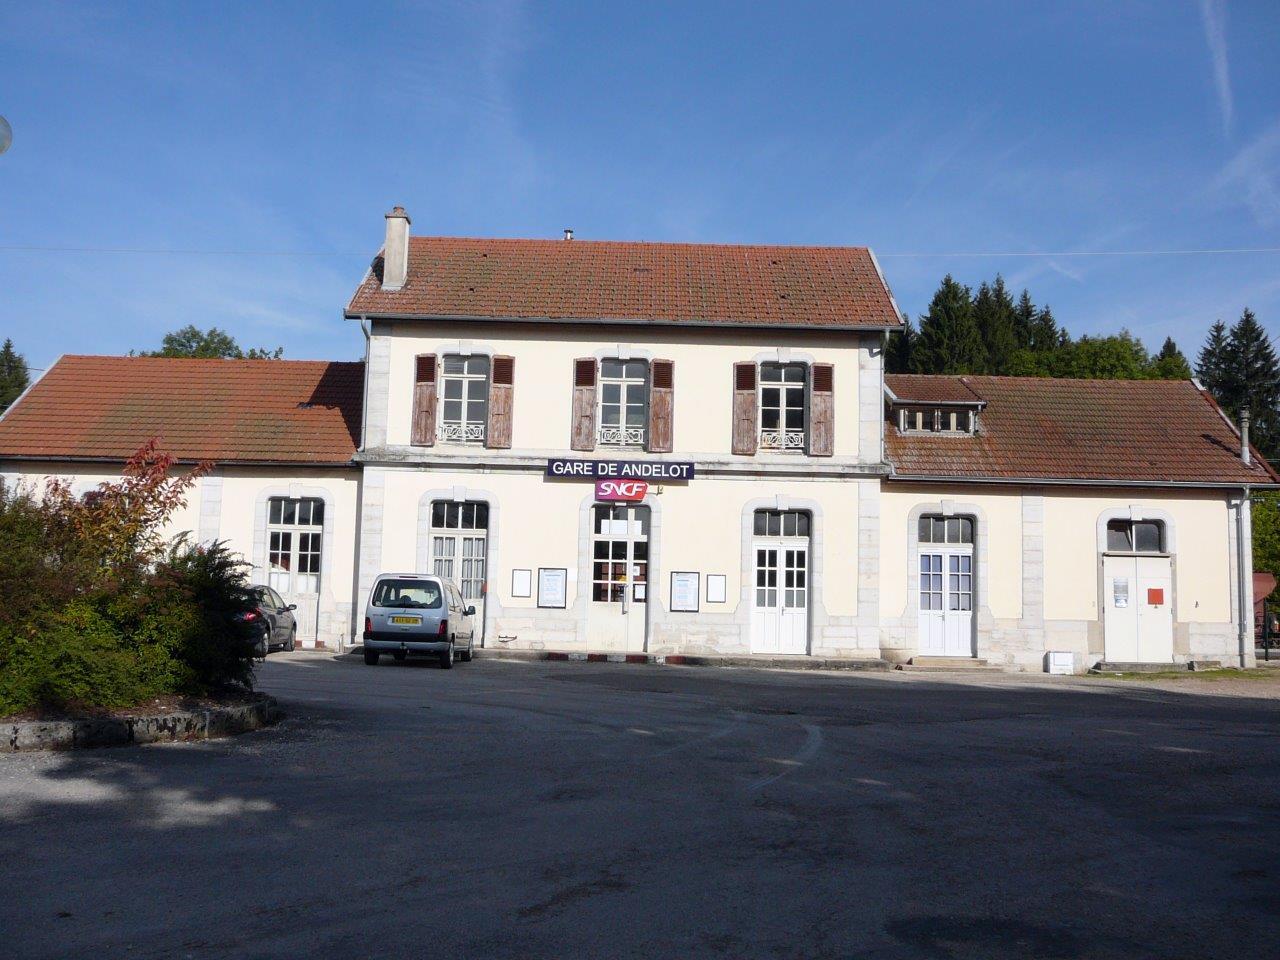 gare-d-andelot-train-station